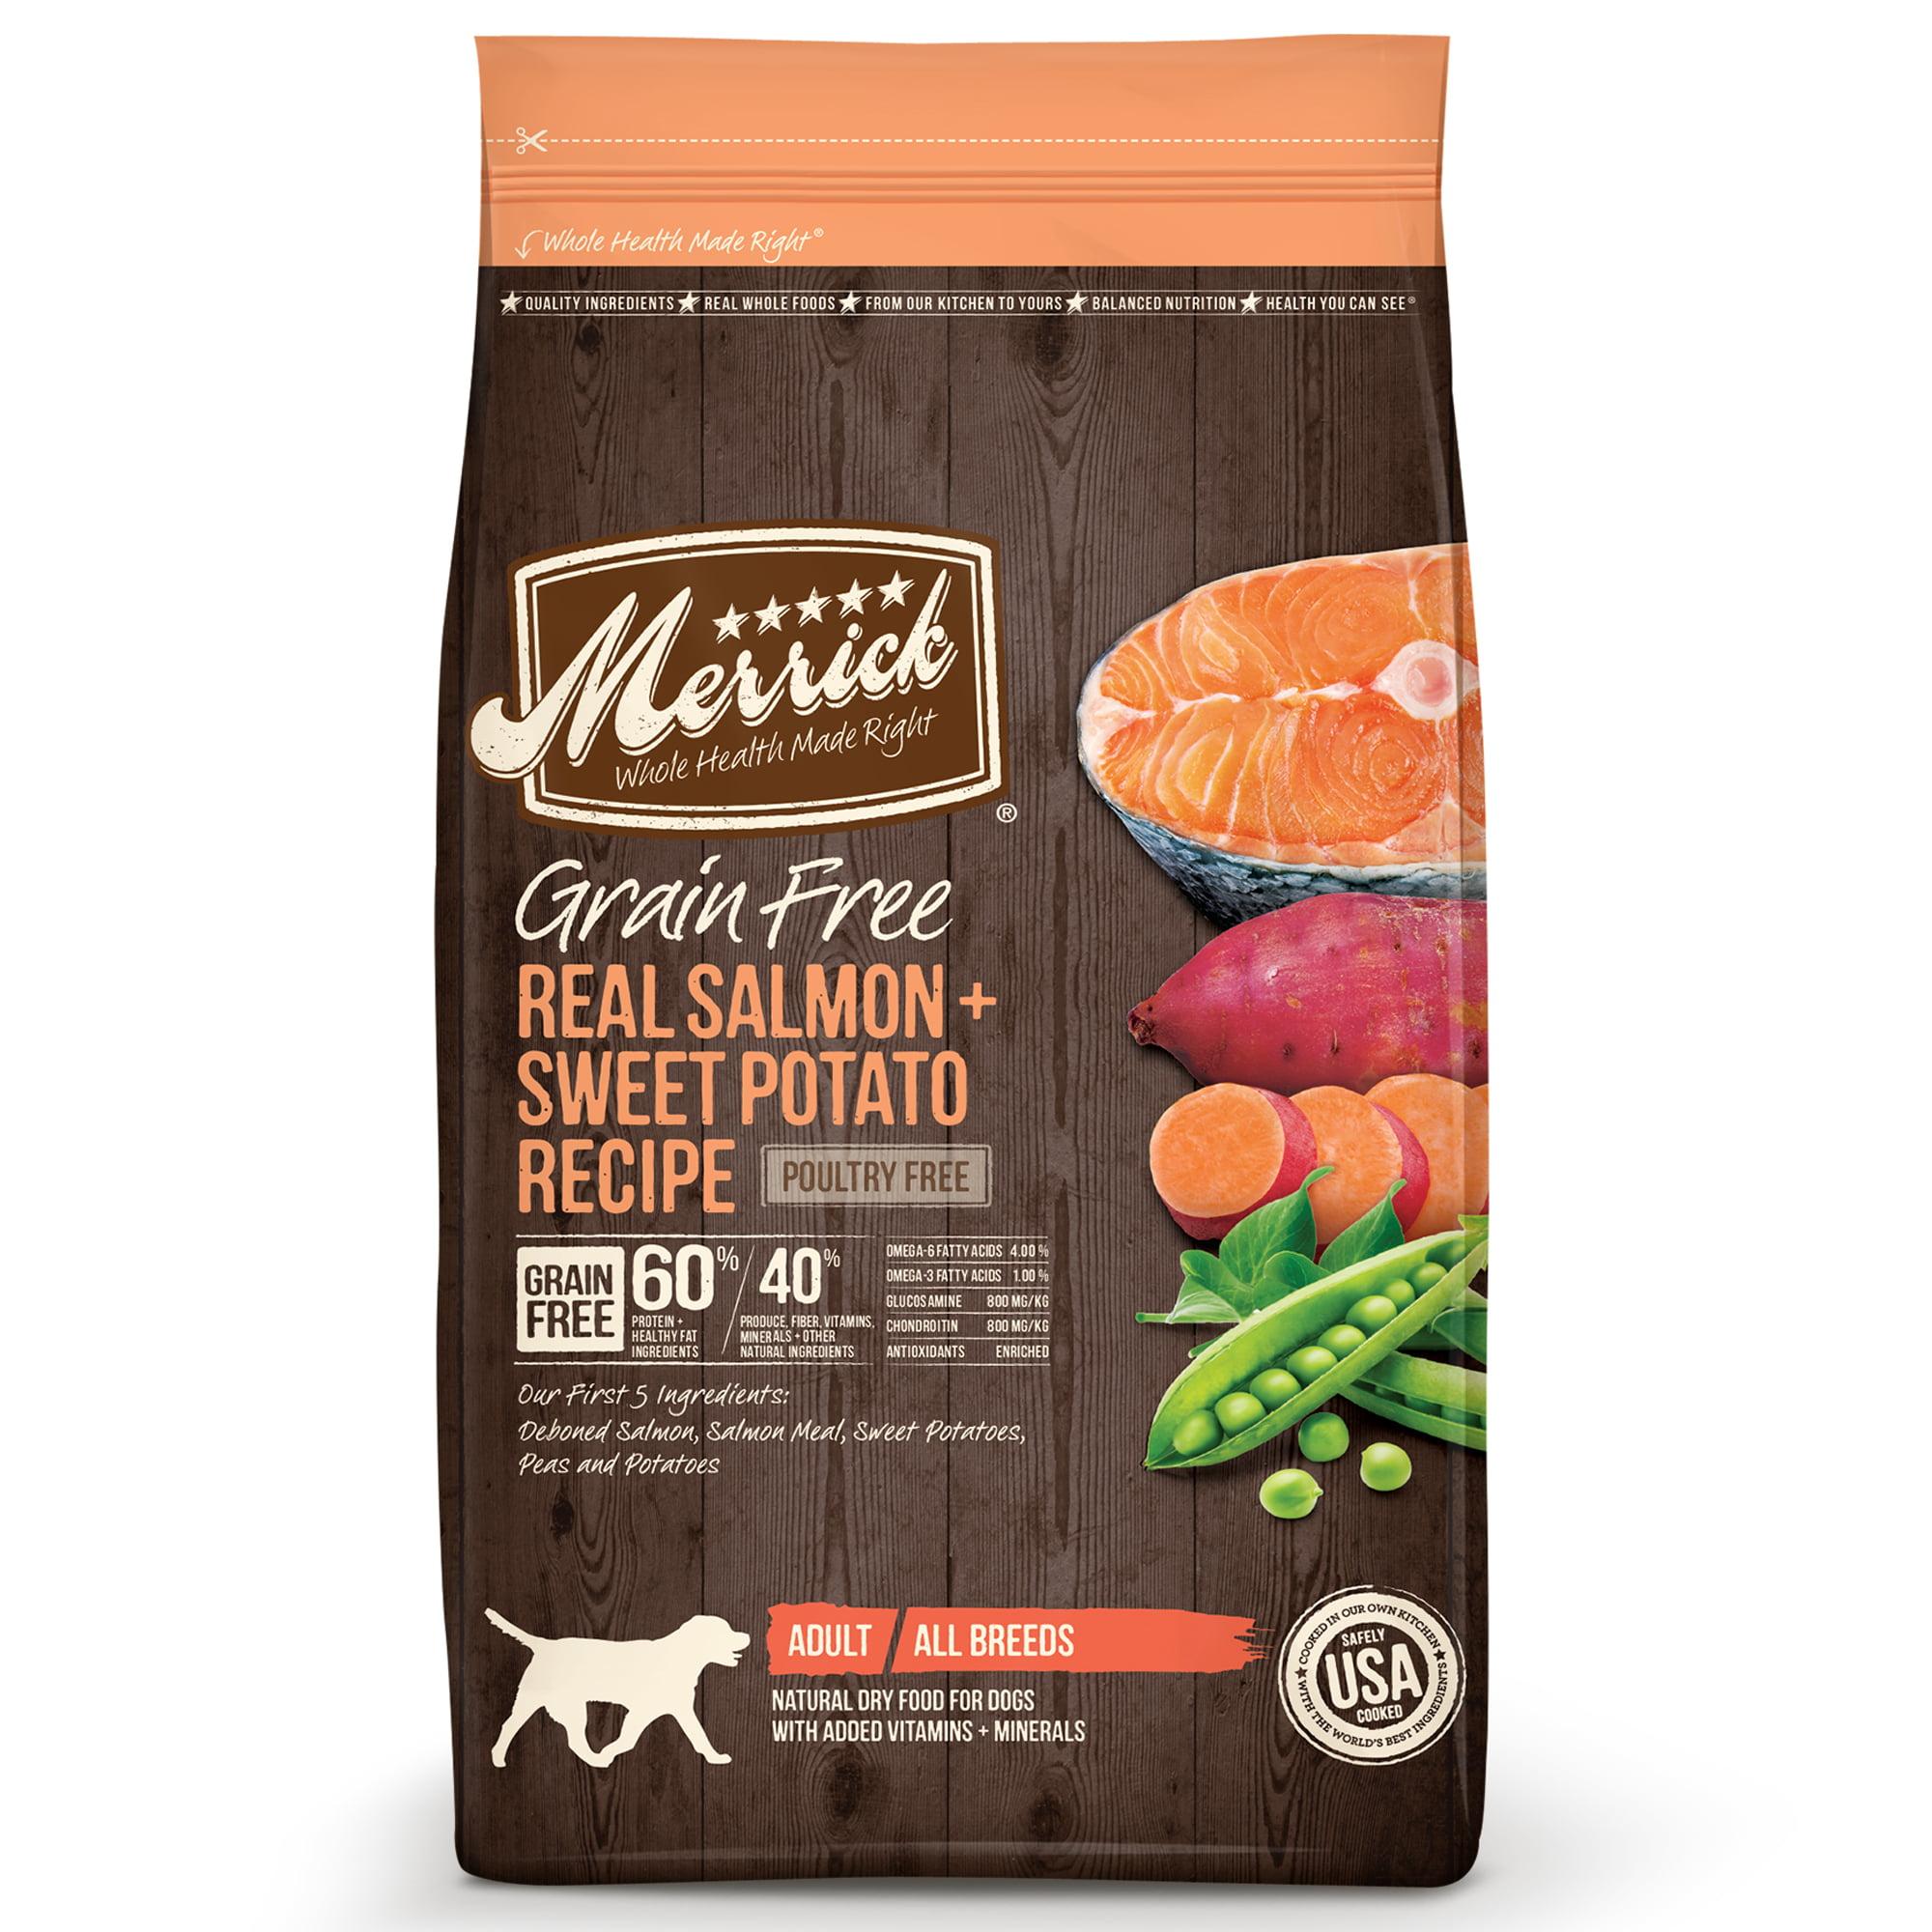 Merrick Grain-Free Real Salmon + Sweet Potato Recipe Dry Dog Food, 12 lb